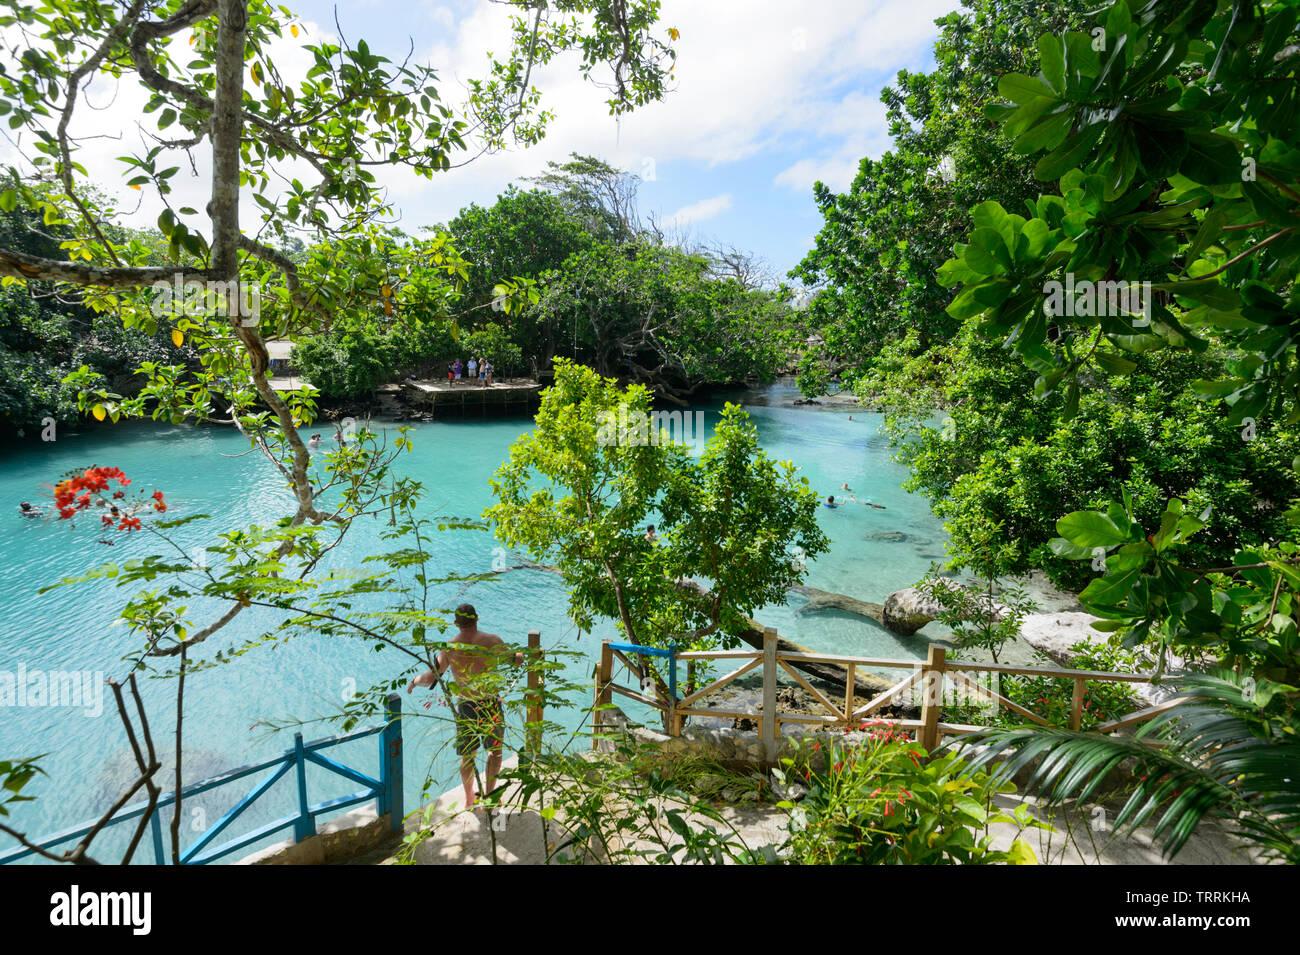 Swimming Hole Stock Photos & Swimming Hole Stock Images - Alamy